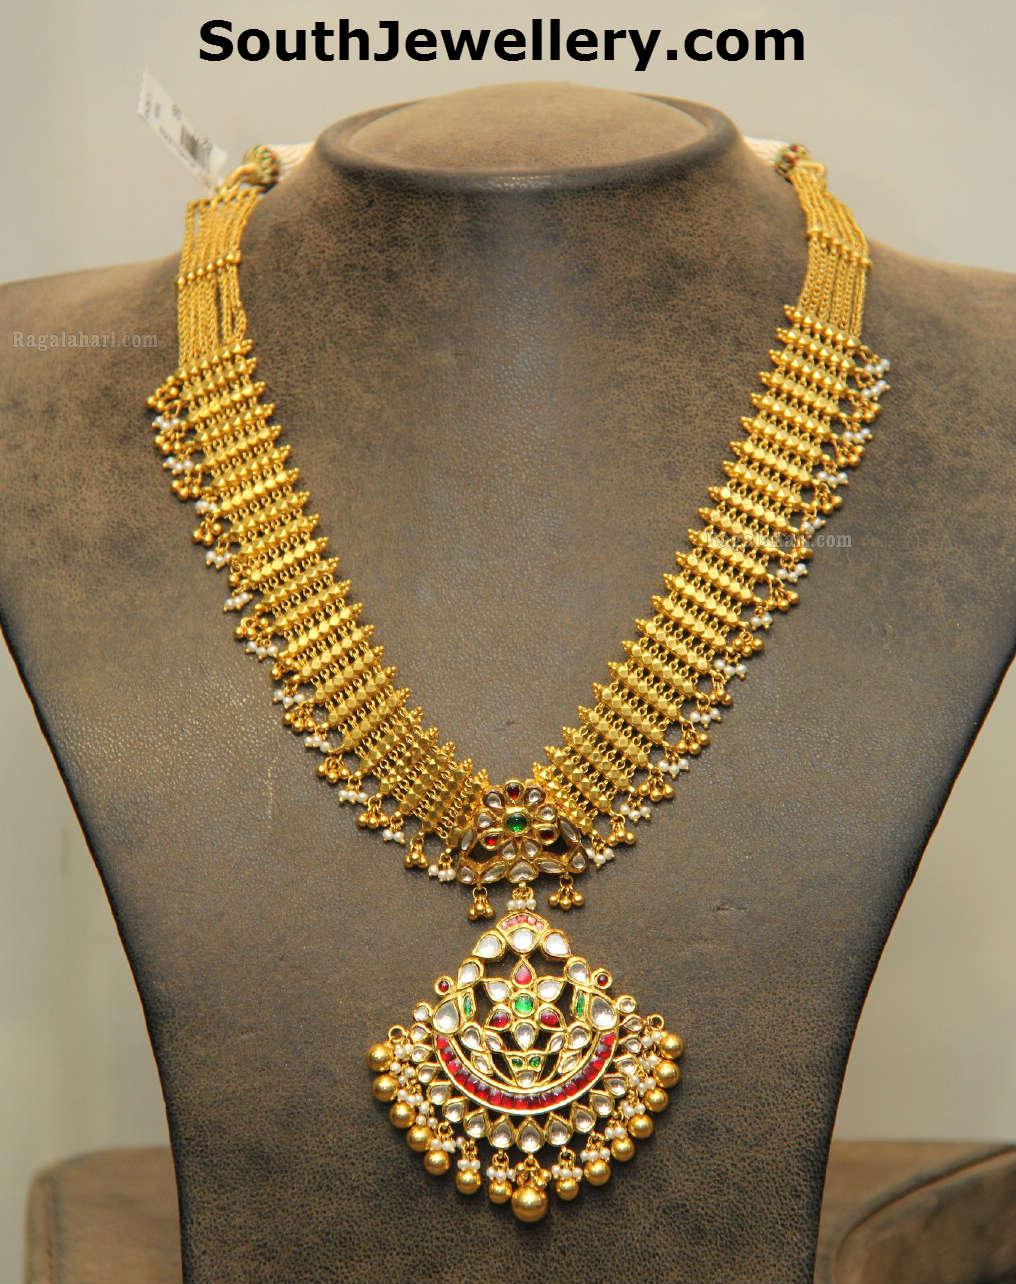 Latest gold necklace designs in grams pachi necklace latest jewellery - Classy Gold Necklace With Kundan Pendant